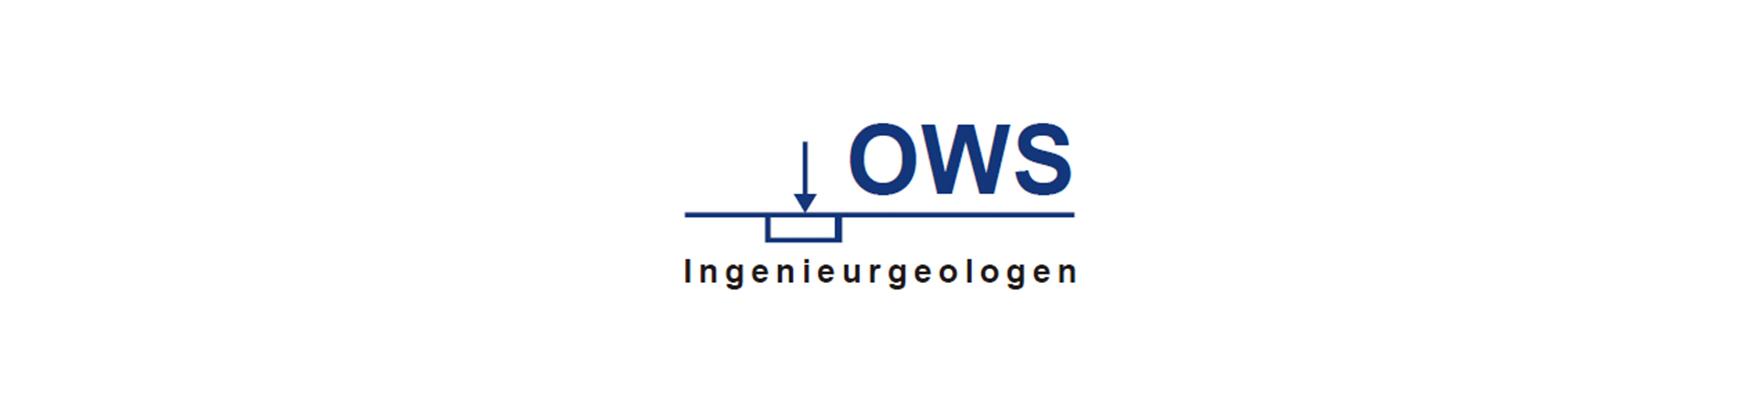 ows-banner